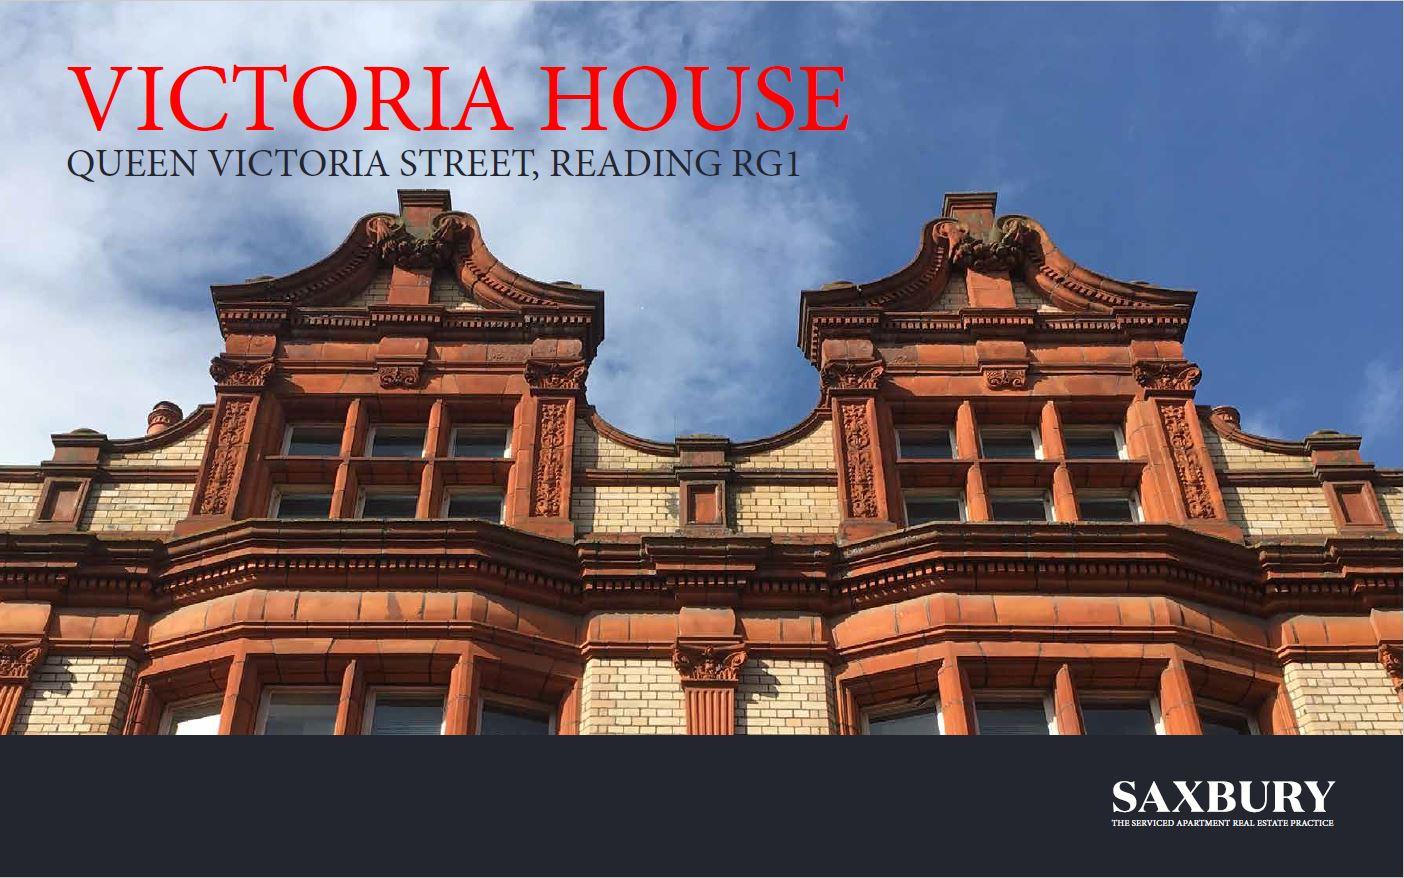 Saxbury-Victoria-House-Serviced-Apartment-Leasing-Reading.JPG